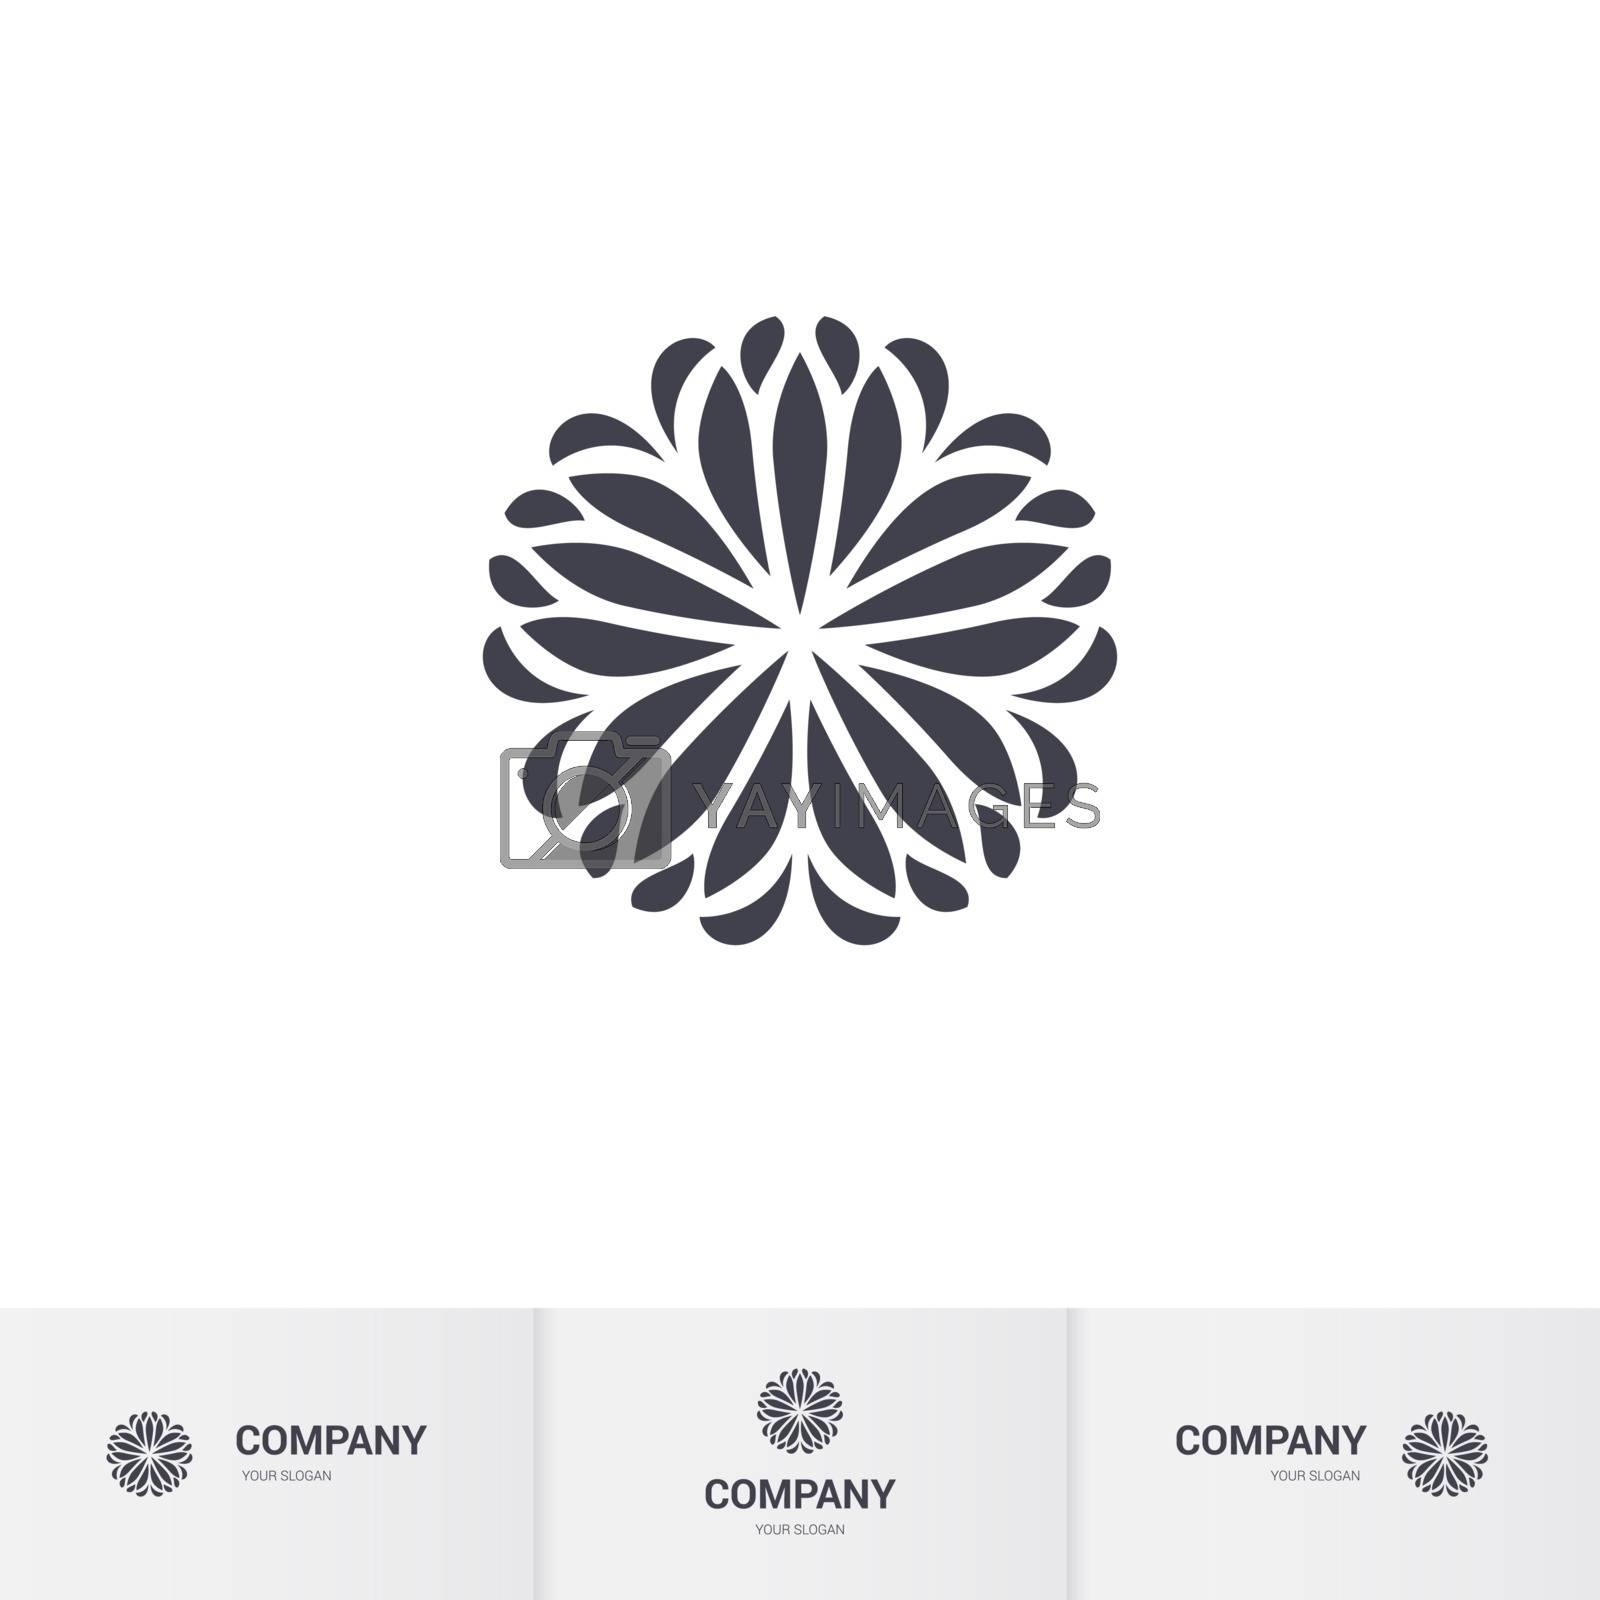 Abstract Floral Geometric Element for Circular Logo. Company Mark, Emblem. Simple Geometric Mandala Logotype